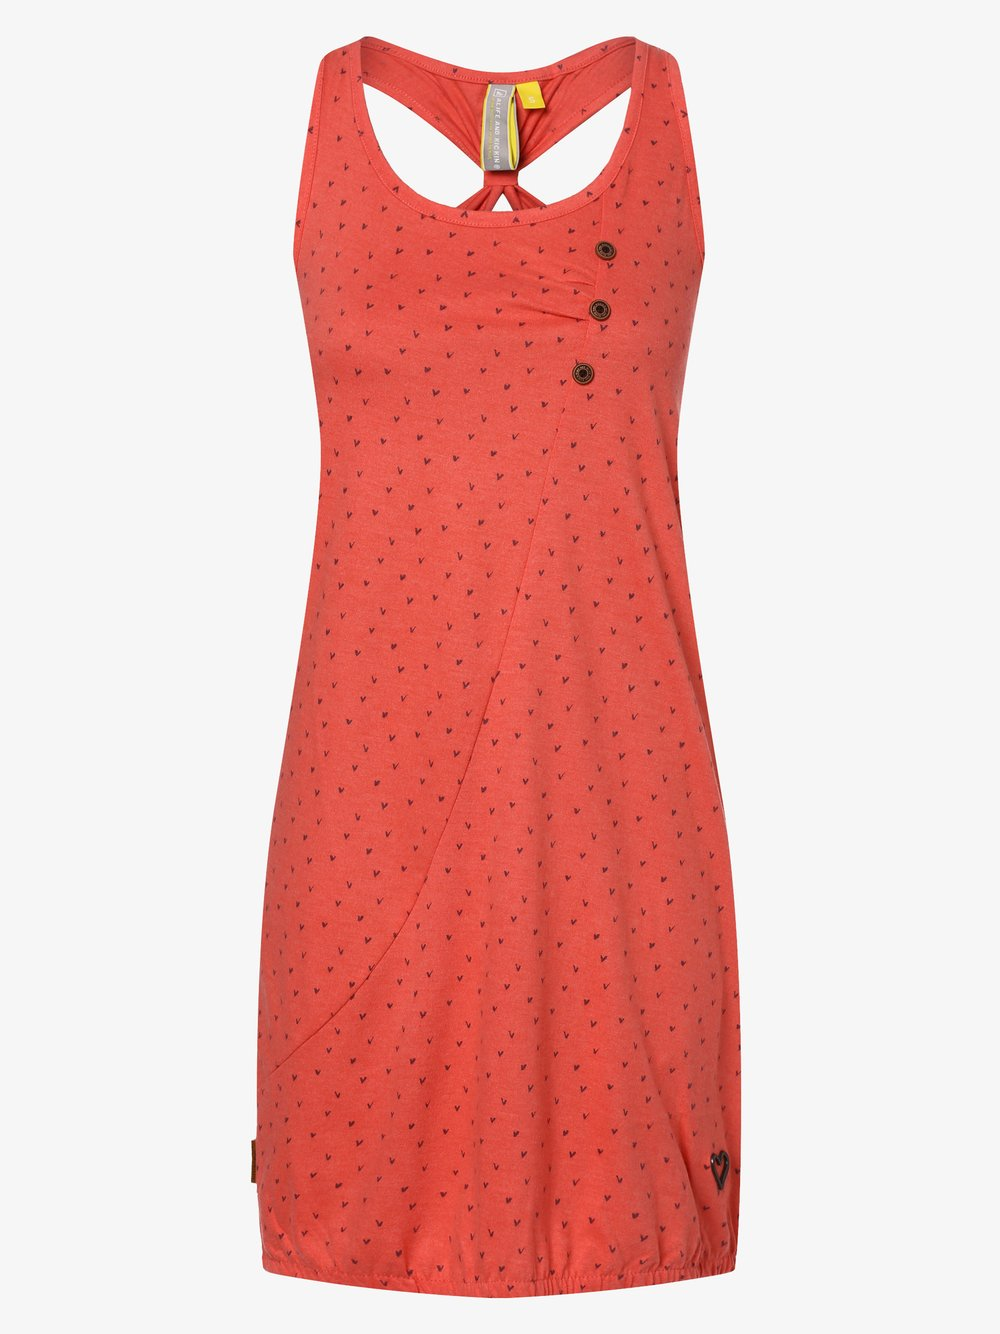 alife and kickin – Sukienka damska – Cameron, czerwony Van Graaf 469869-0001-09940